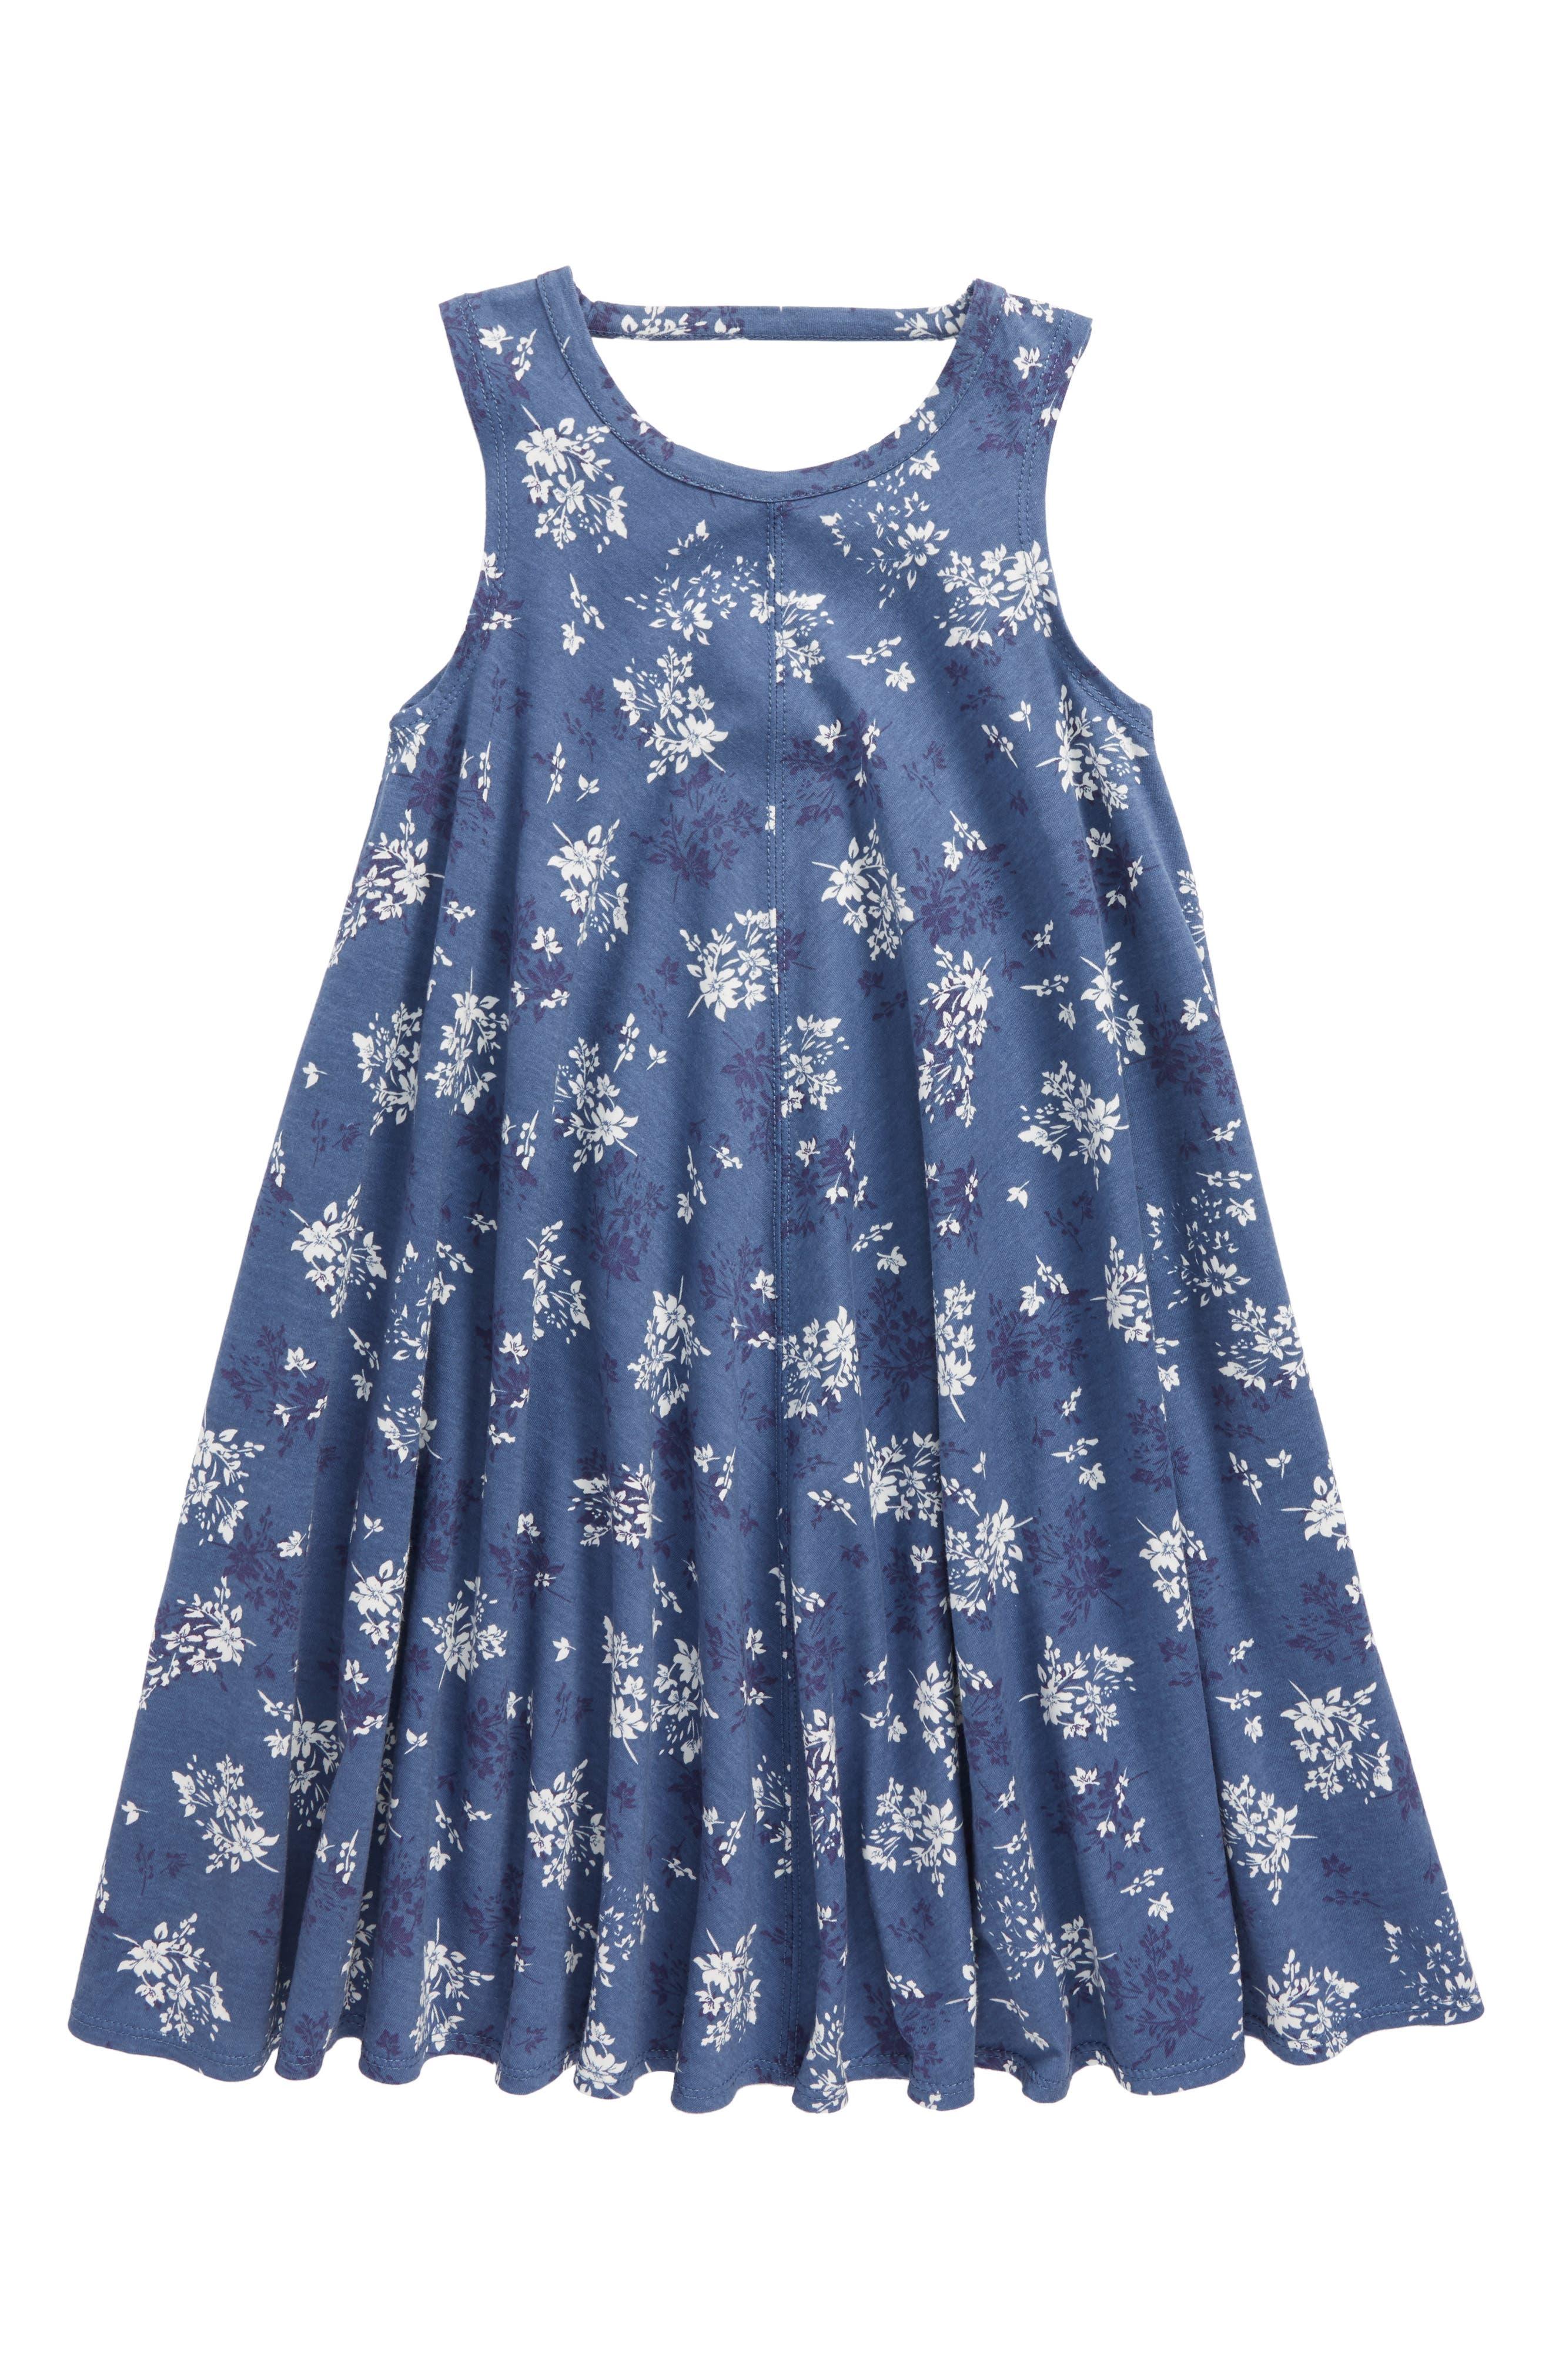 Cotton Swing Dress,                             Main thumbnail 1, color,                             420